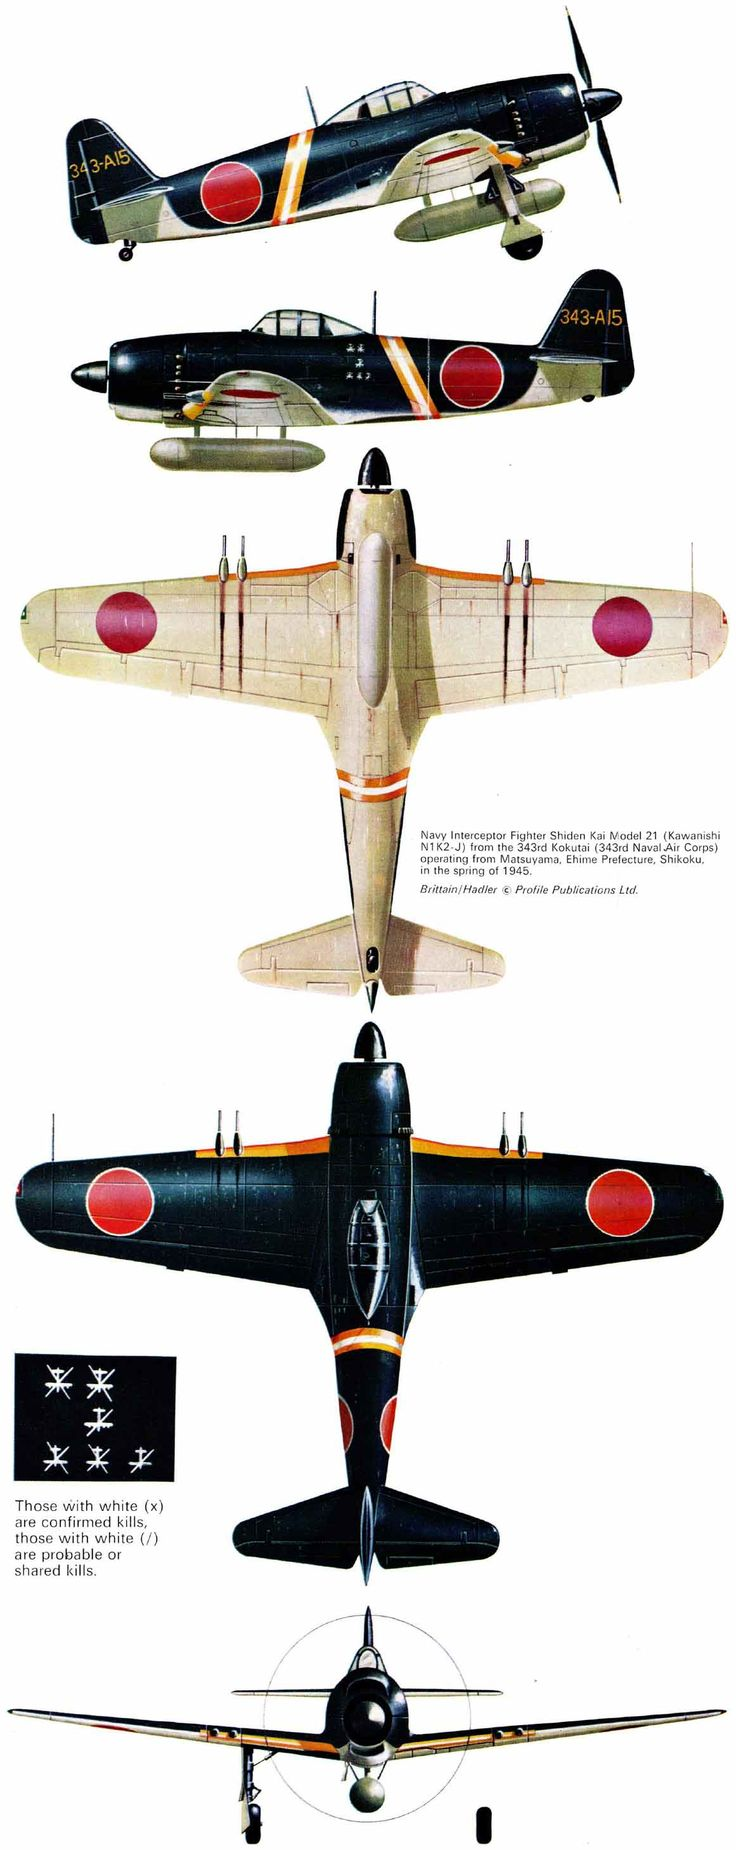 "Kawanishi N1K2-J Model 21, unit Sentou 301st Hikoutai 'Shinsen-Gumi', 343rd kokutai, serial 343-A15, pilot Lt.Naoshi Kanno (72 victories, August 1st, 1945 KIA), Matsuyama, Ehime Prefecture, Shikoku, Spring 1945.  Artist: © Tom Brittain  Source: ""Kawanishi N1K Kyofu/Rex & Shiden/GEORGE"" by Rene J.Francillon, Ph.D., Profile Publications Ltd, No.213"